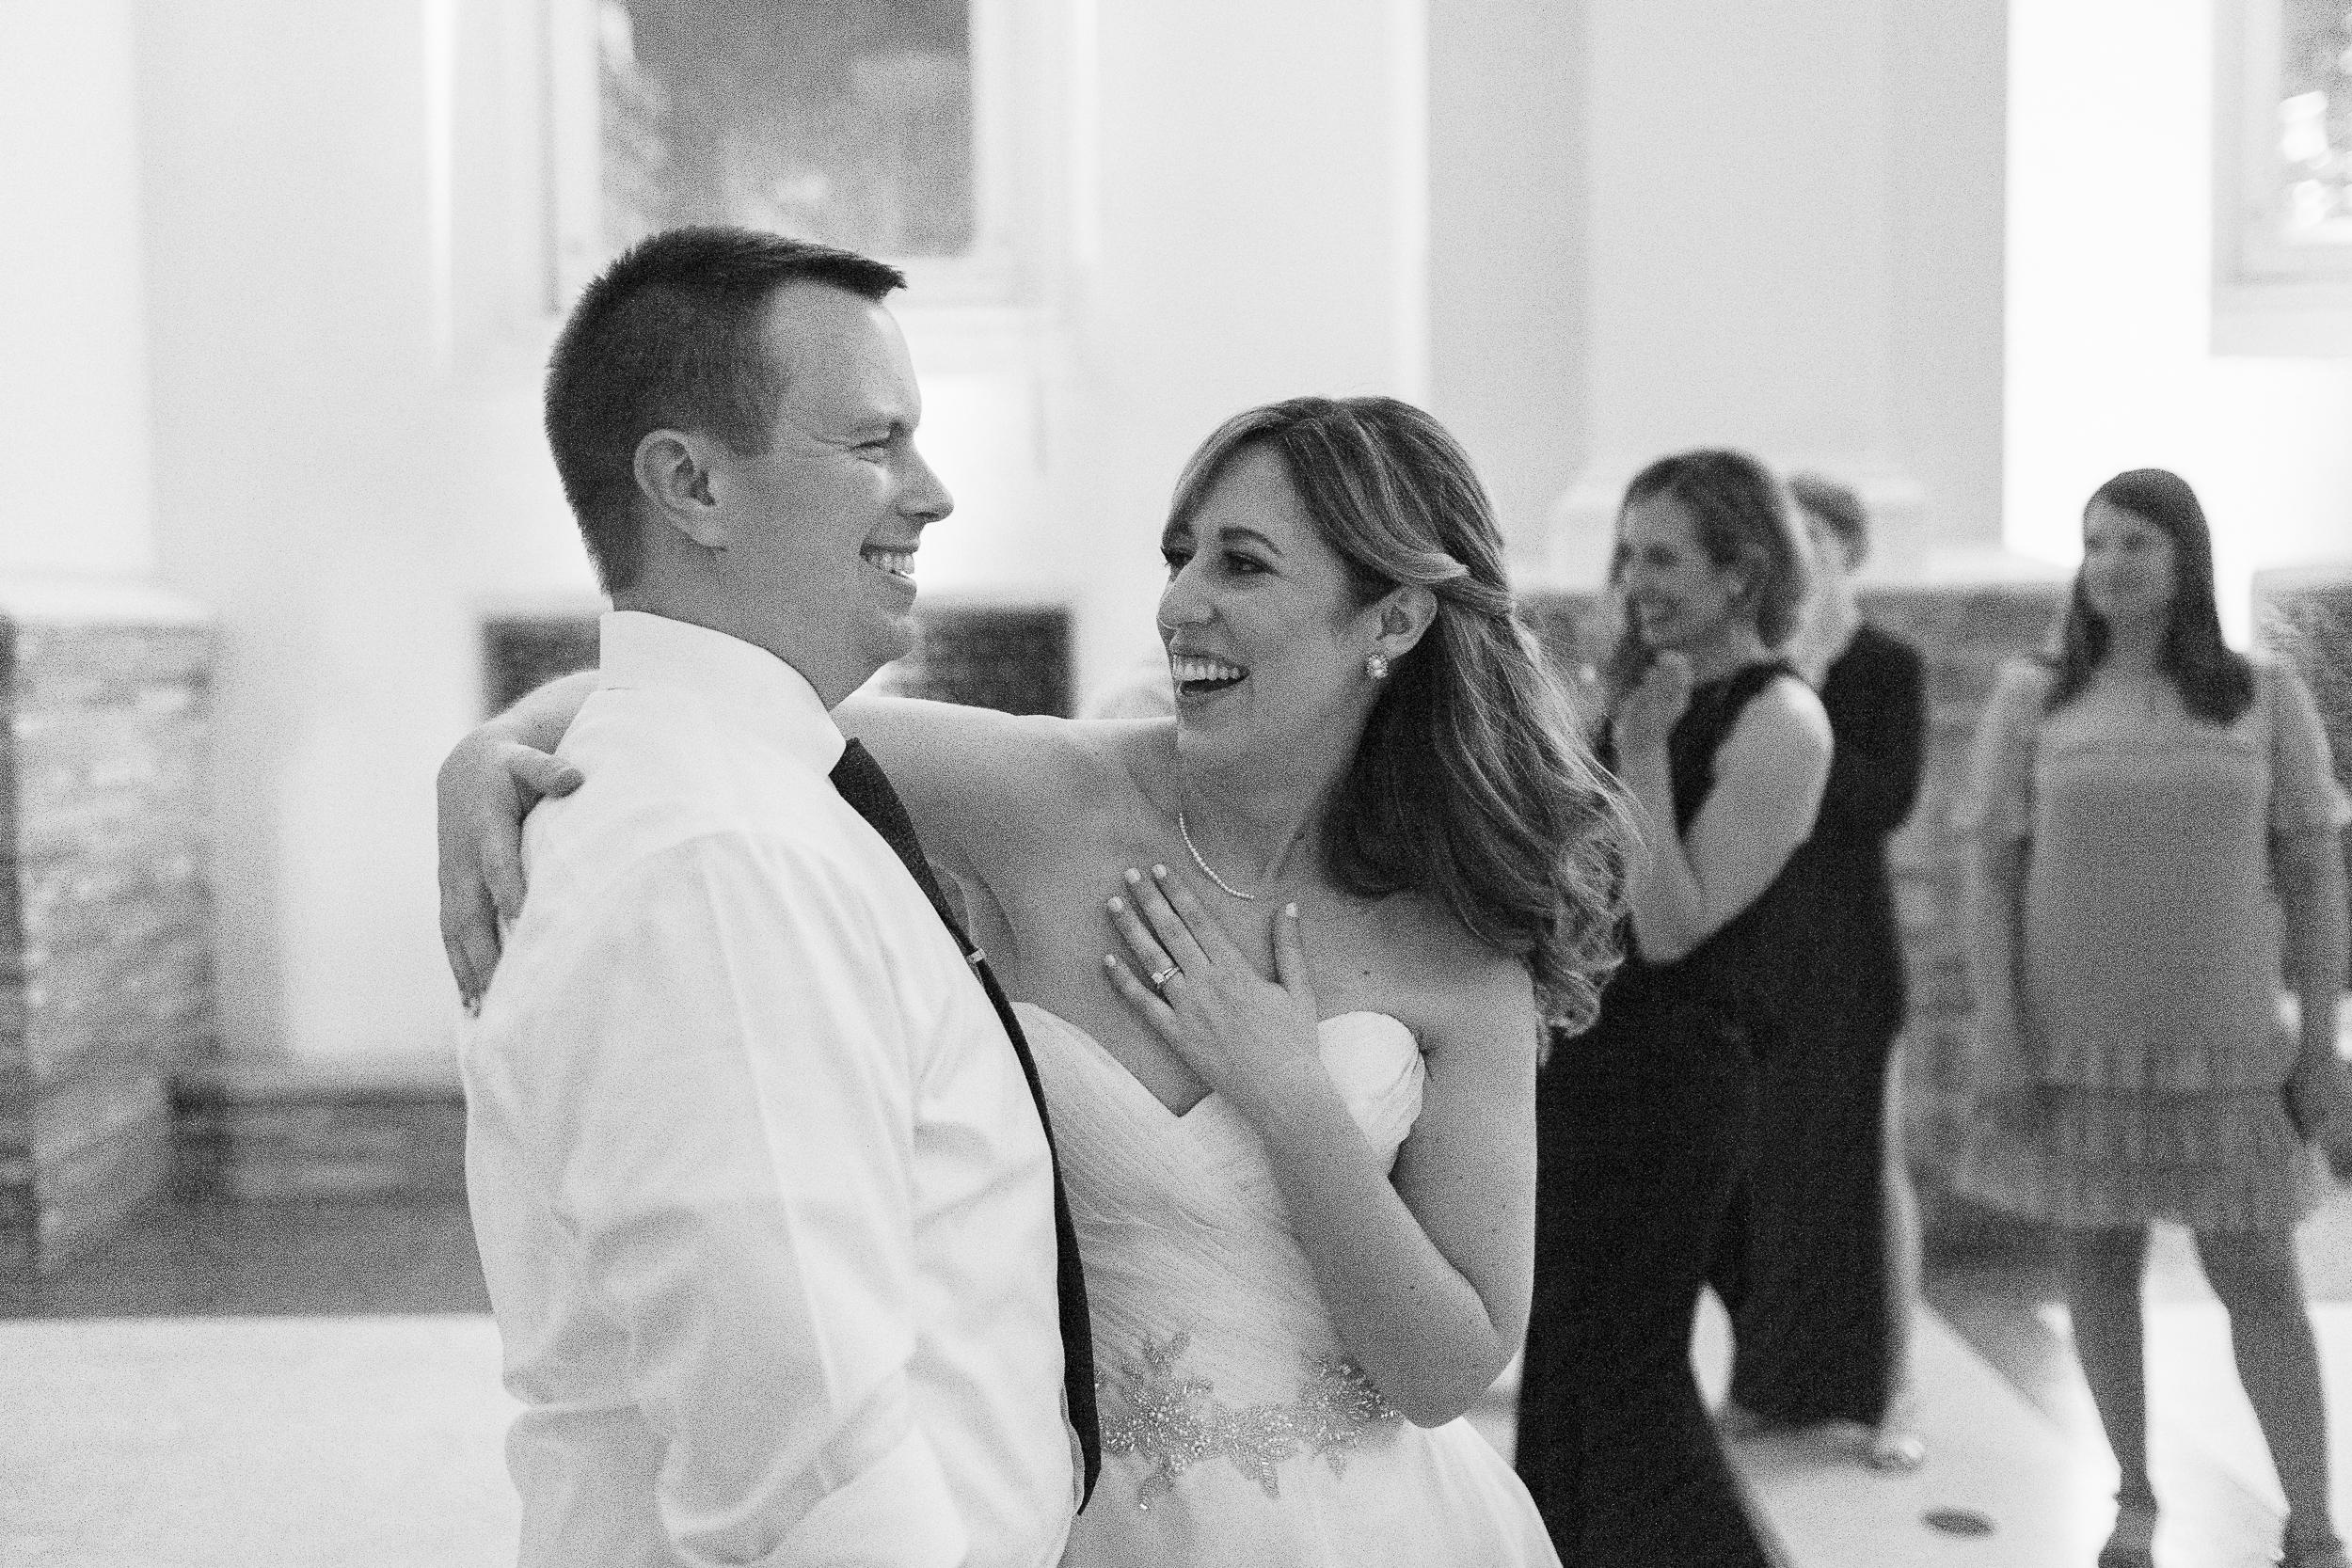 boston-public-library-wedding-016.JPG